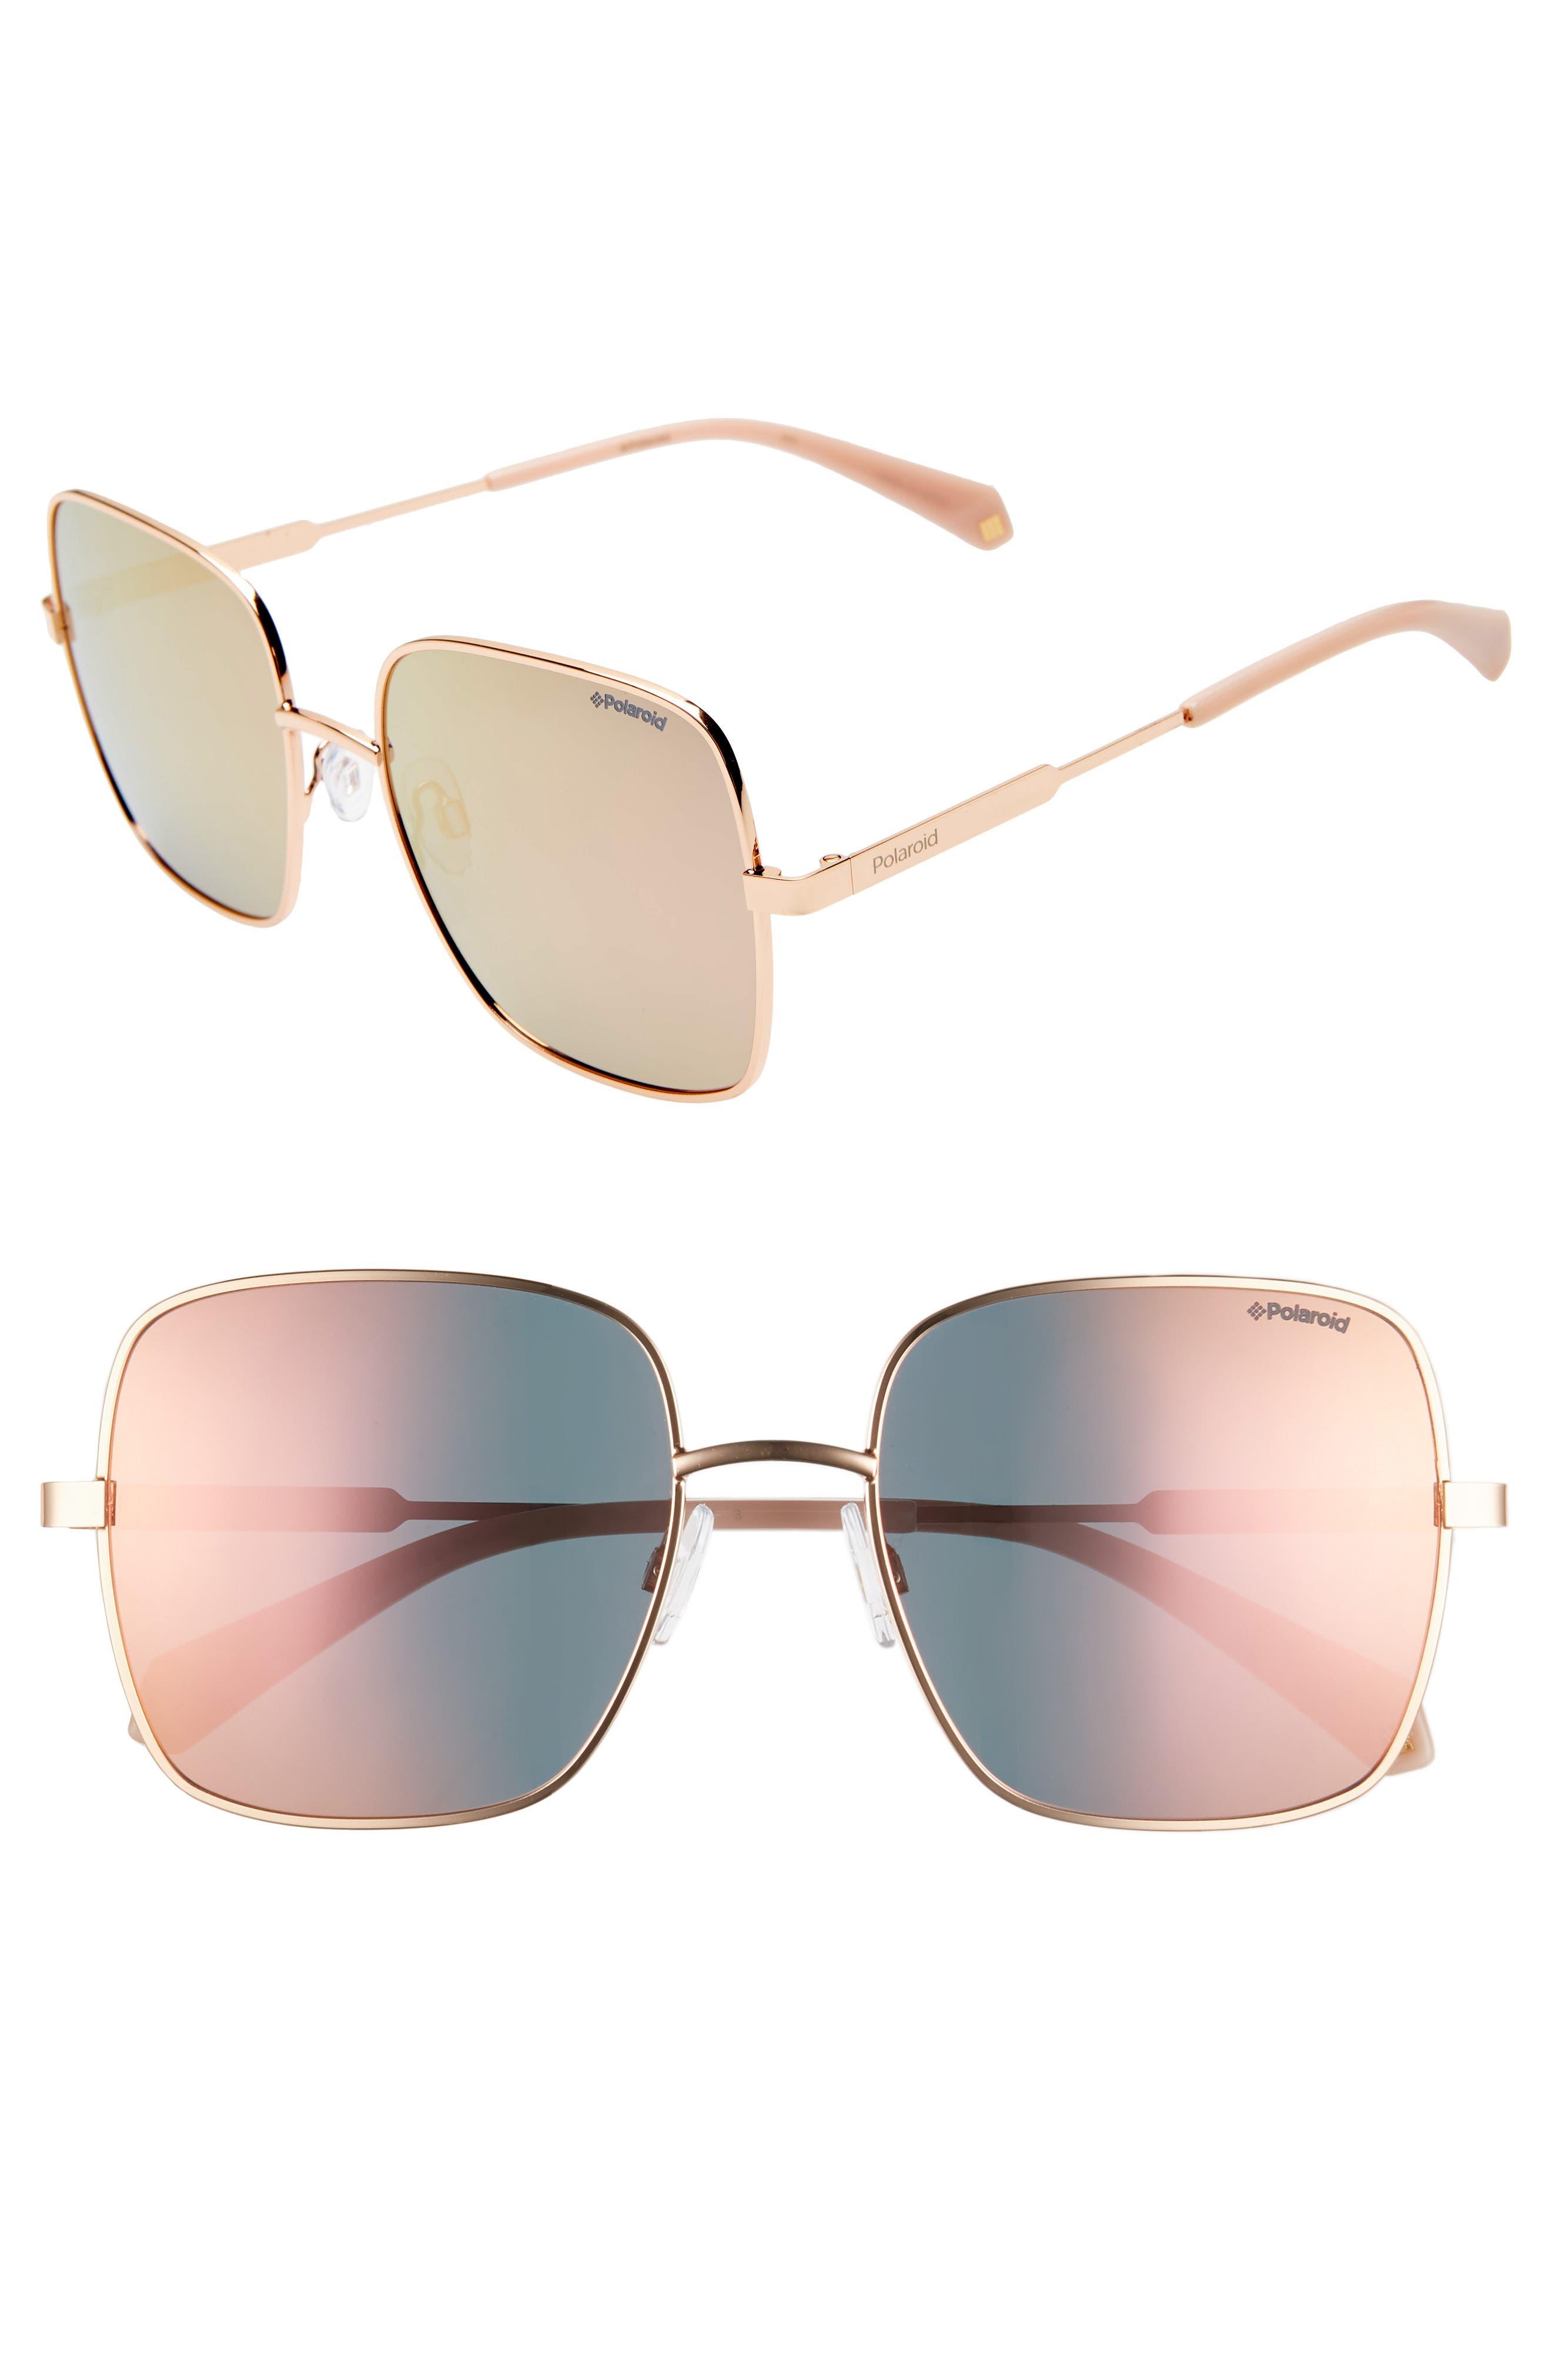 Polaroid 57Mm Polarized Square Sunglasses - Gold/ Pink